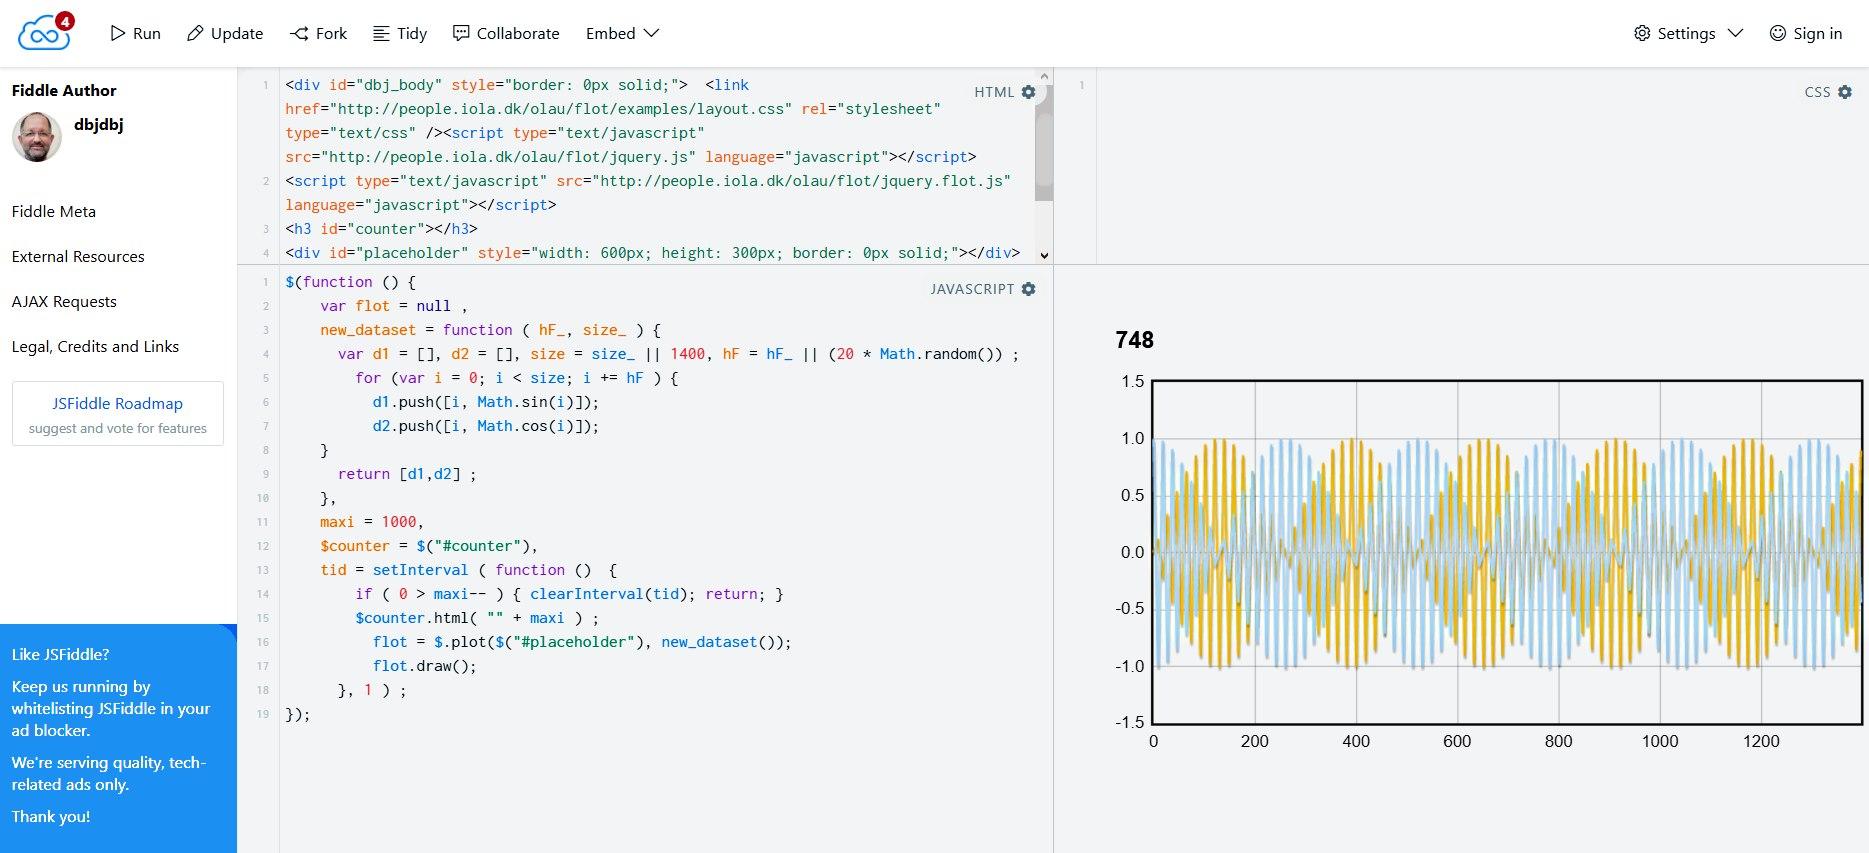 Snazzy Java Script + Flot